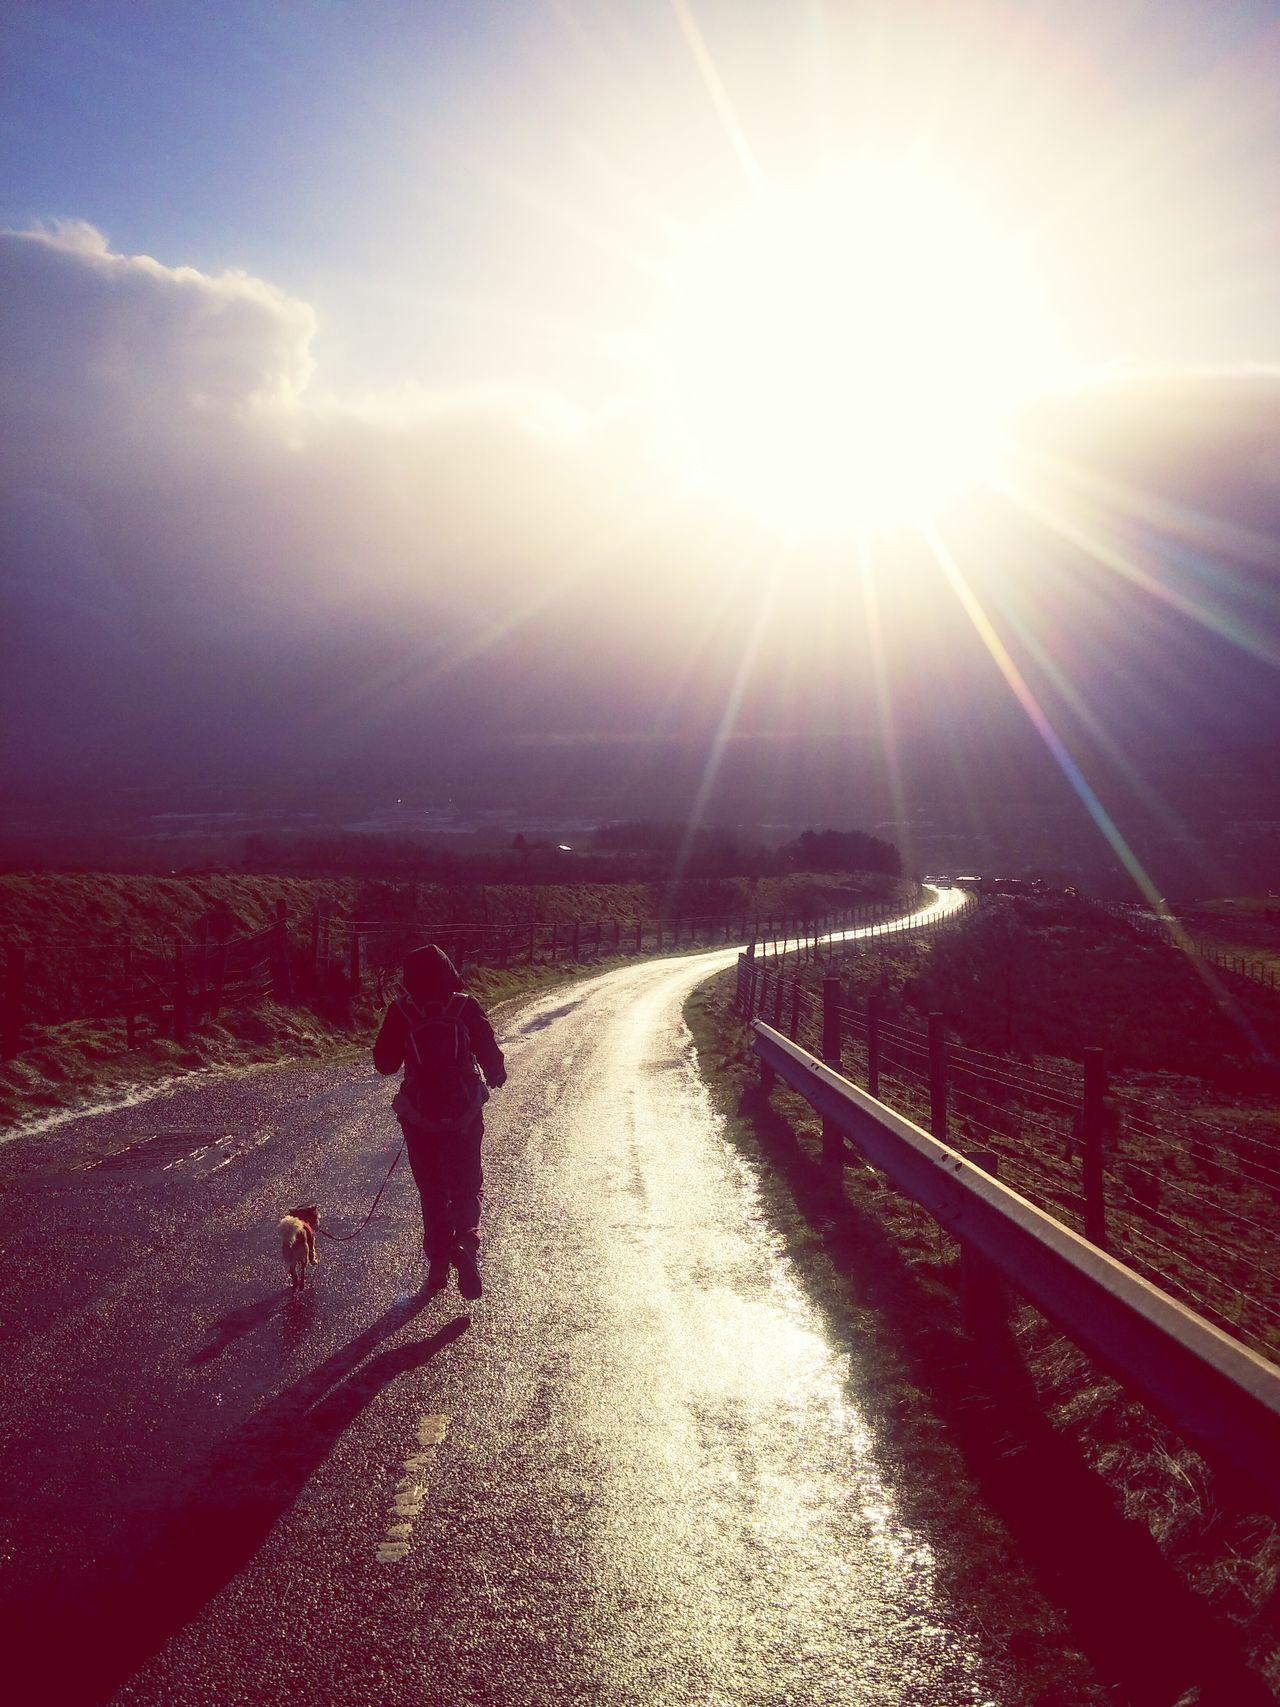 Dog Walking Dog Dog Love Dog Walking Winding Road Hills Hilking Sun Light Burst Road Path Pathways Ramble